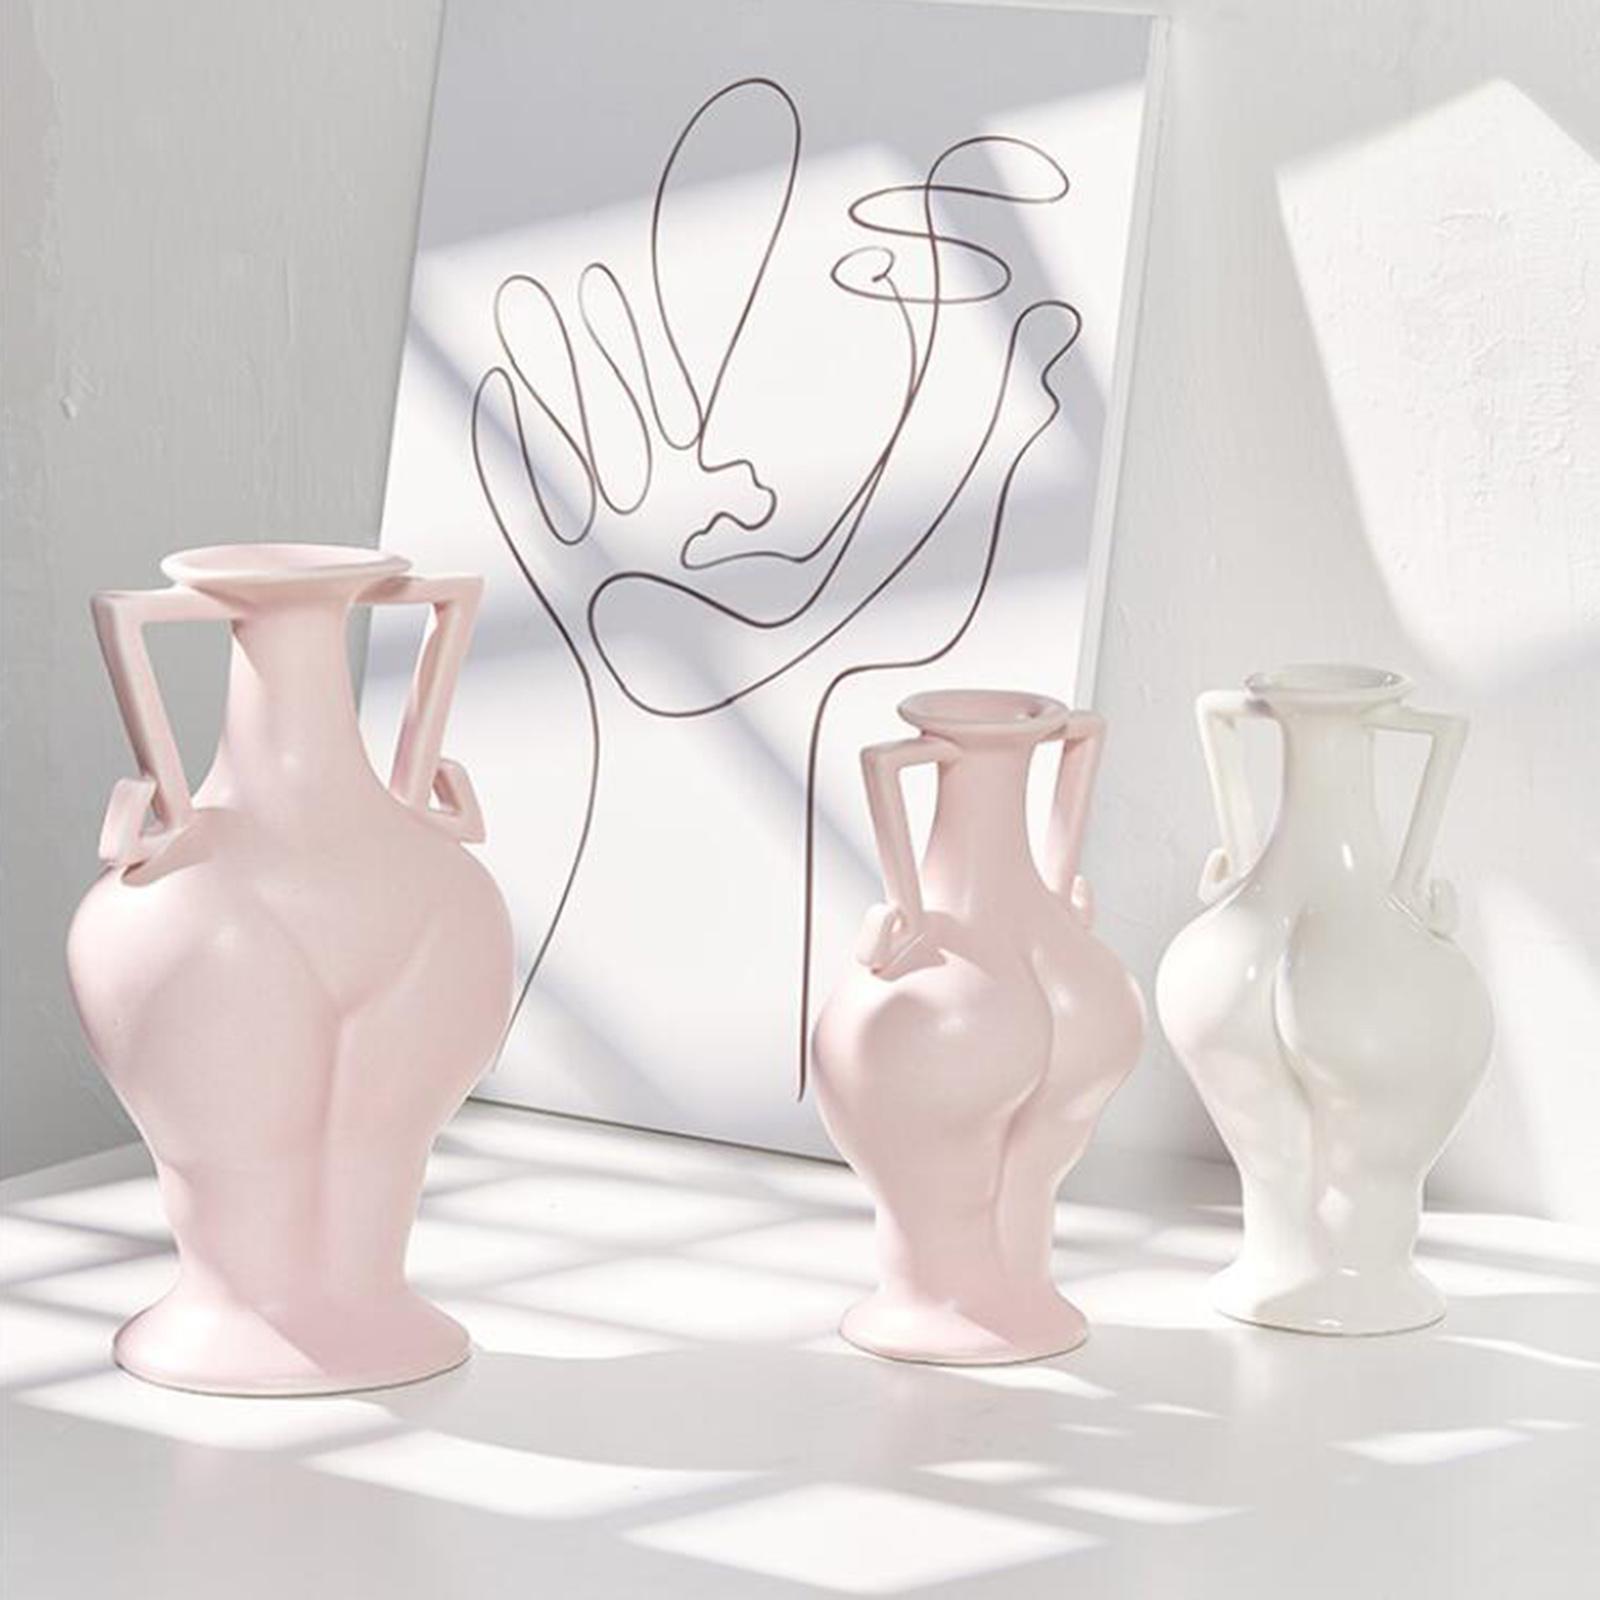 Indexbild 44 - Blumenvase Keramik Blumentöpfe Trockenblumenhalter Pflanzenvasen Wohnkultur